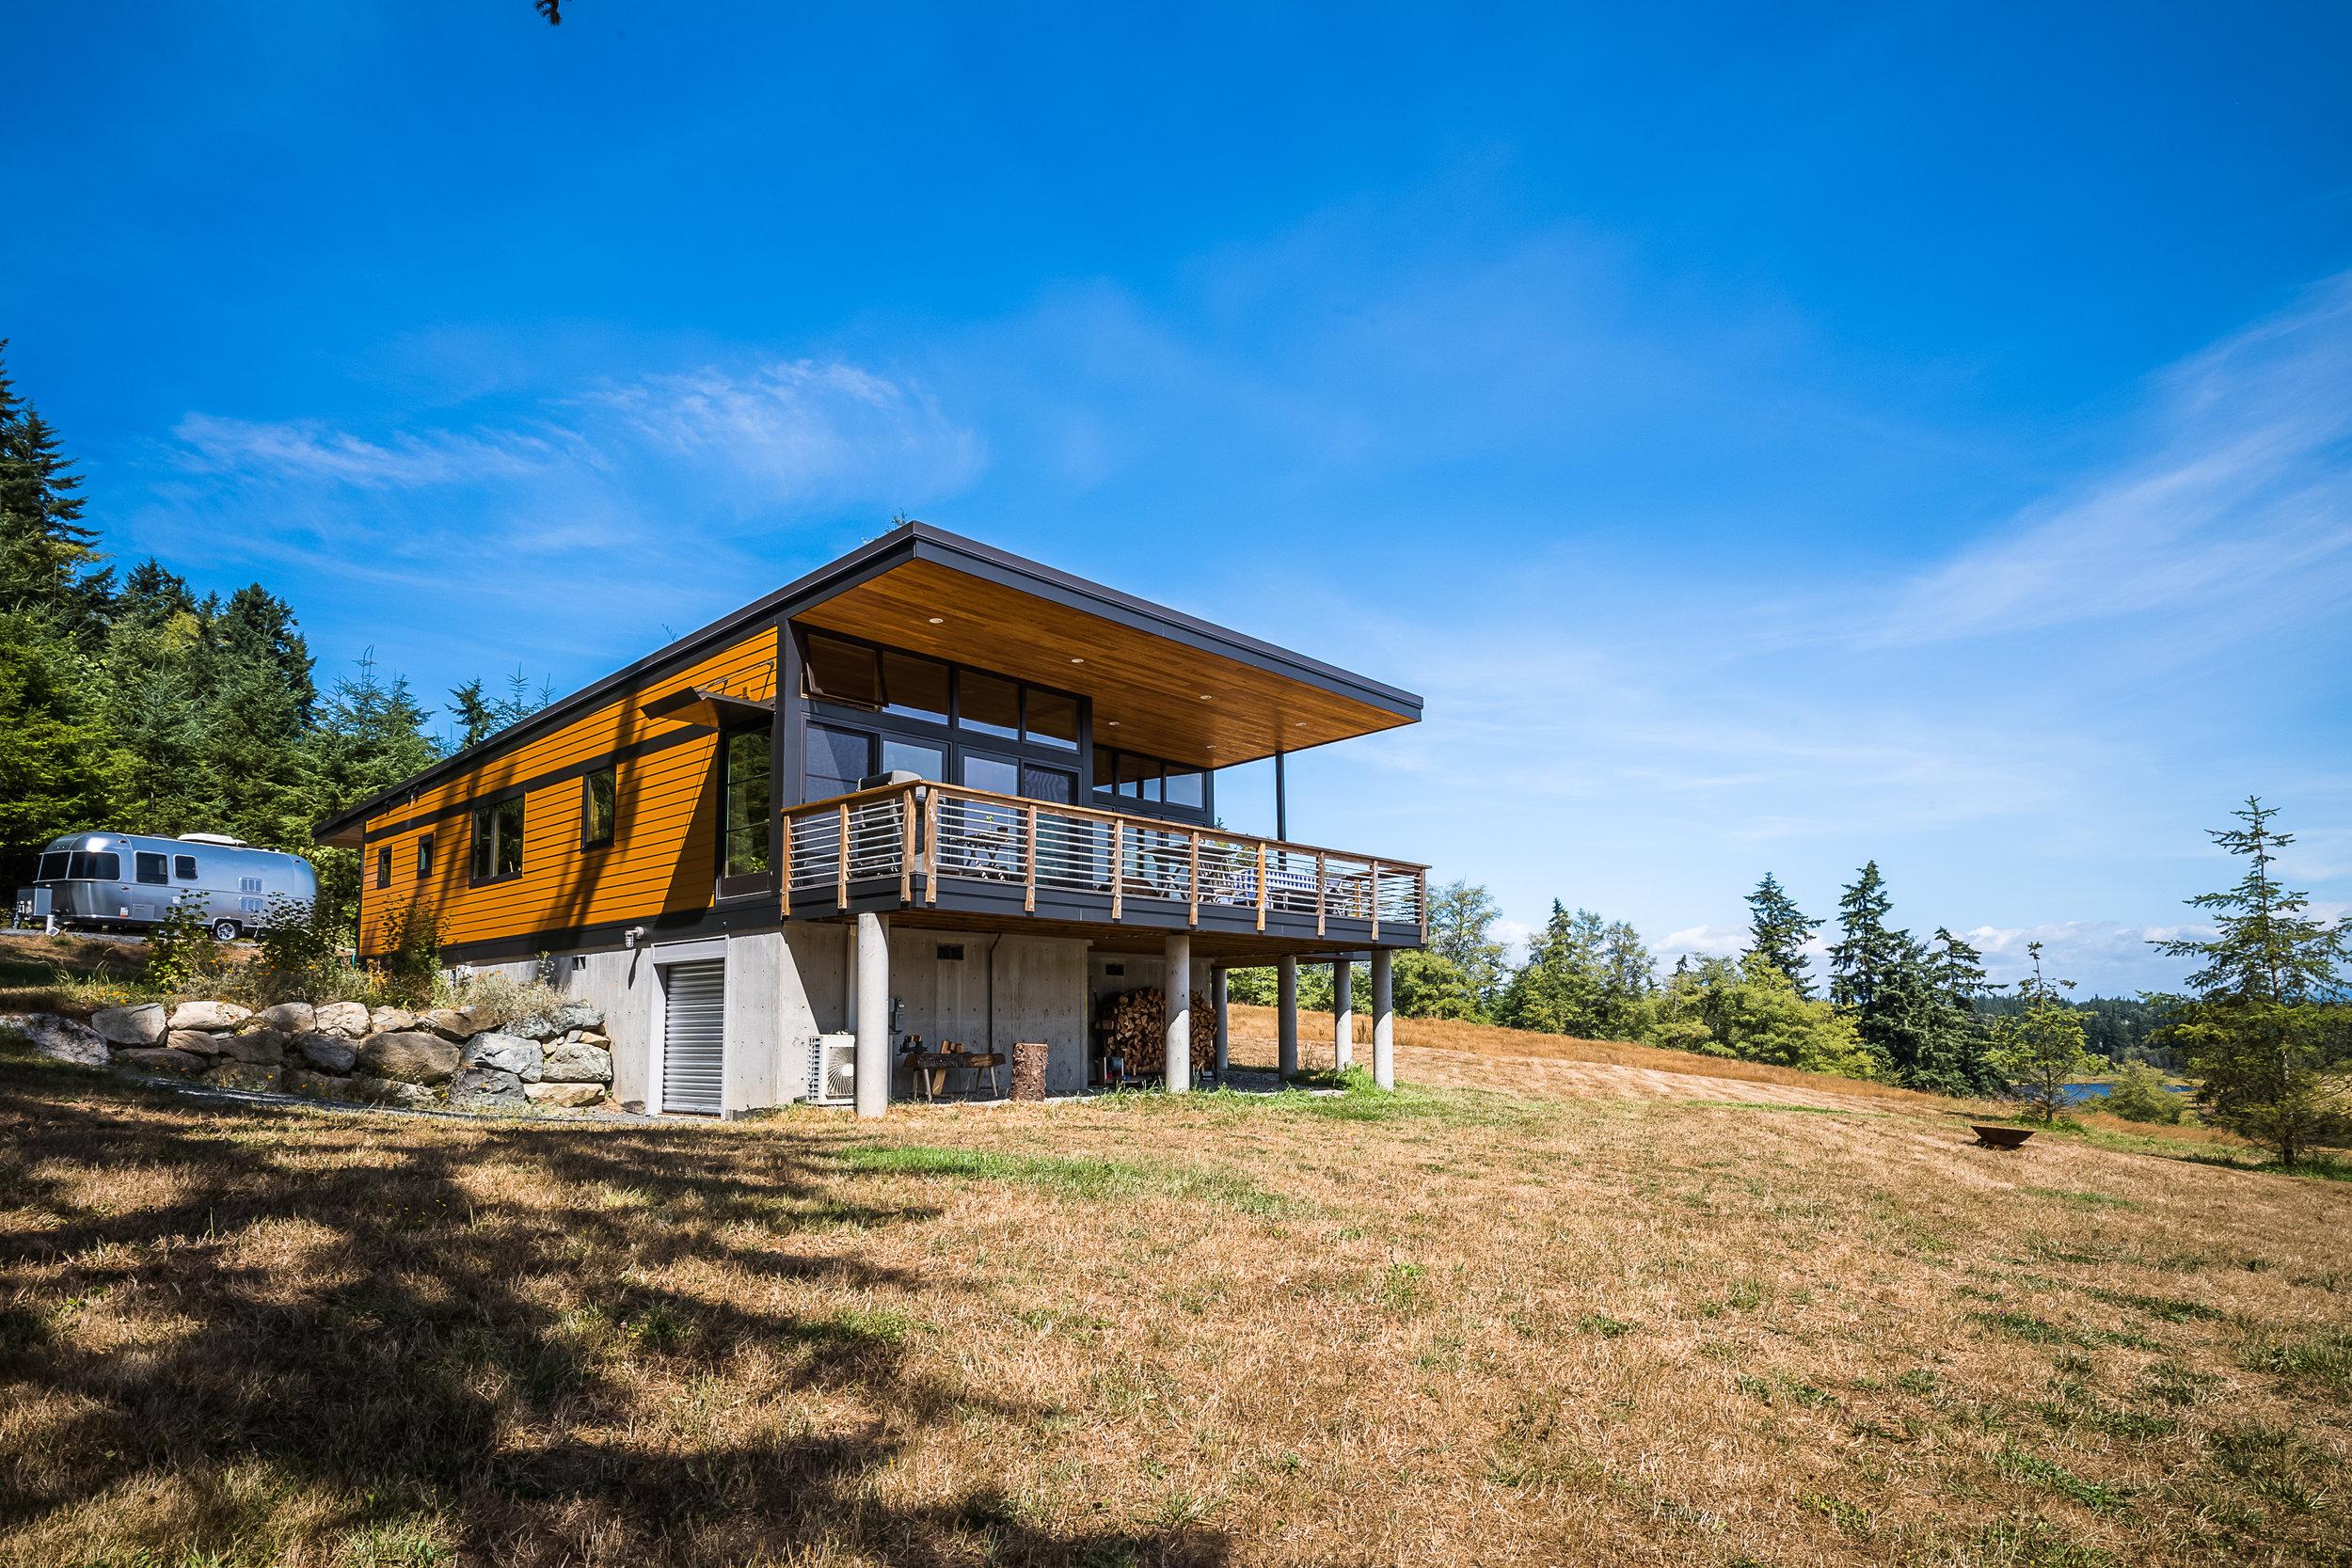 Photo Credit: Dale Tu // Architect: Prentiss Balance Wickline // Builder: Method // 1470sf